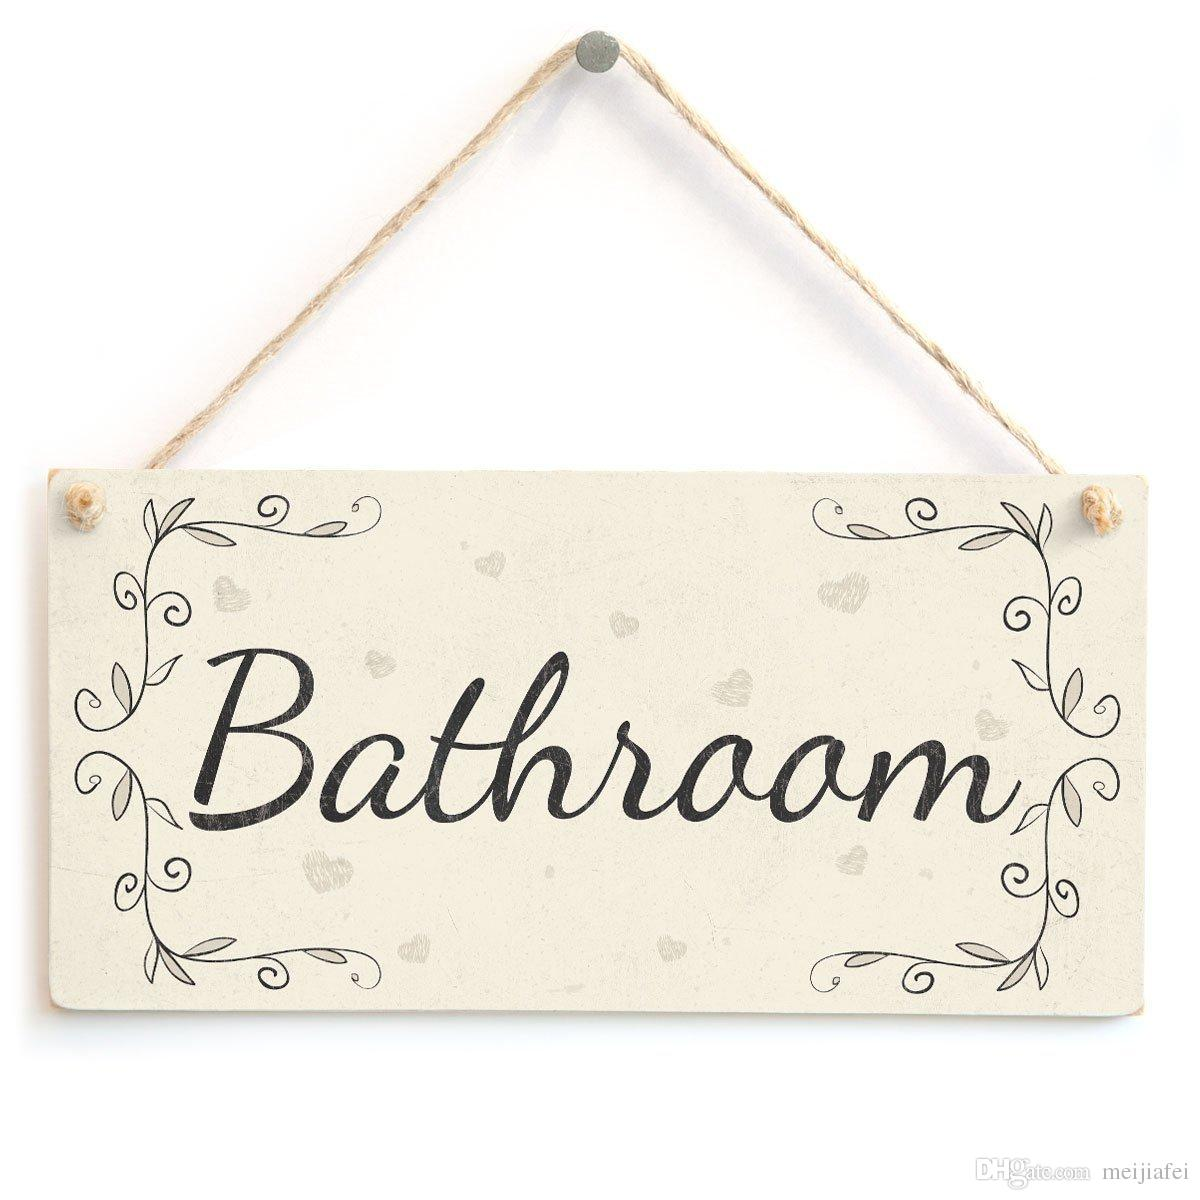 Meijiafei Bathroom French Type Home Decor Accessories Bathroom